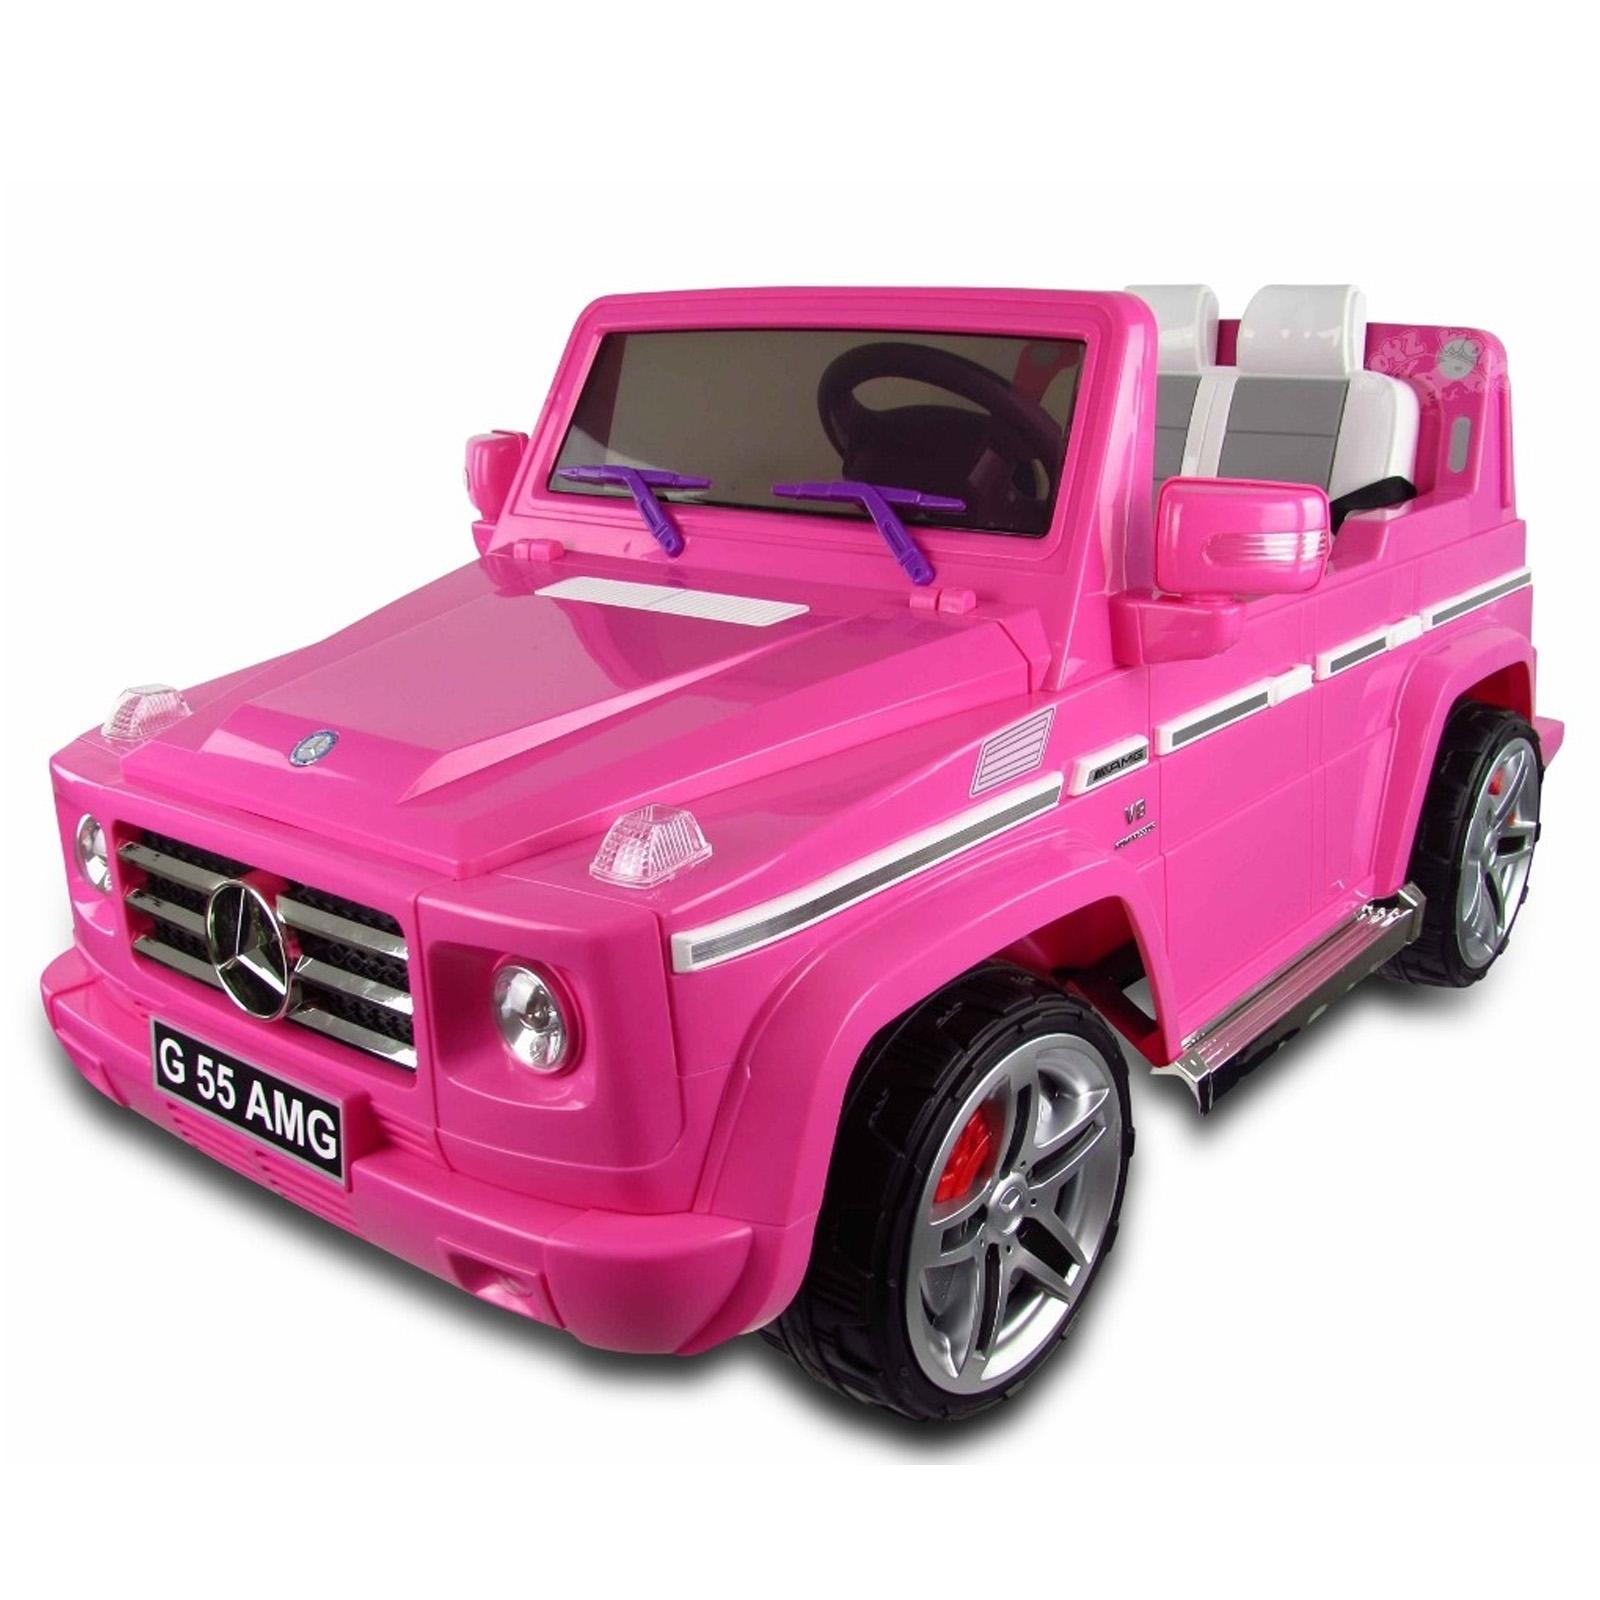 Mercedes benz g55 ride on suv car 12v pink for Pink mercedes benz power wheels